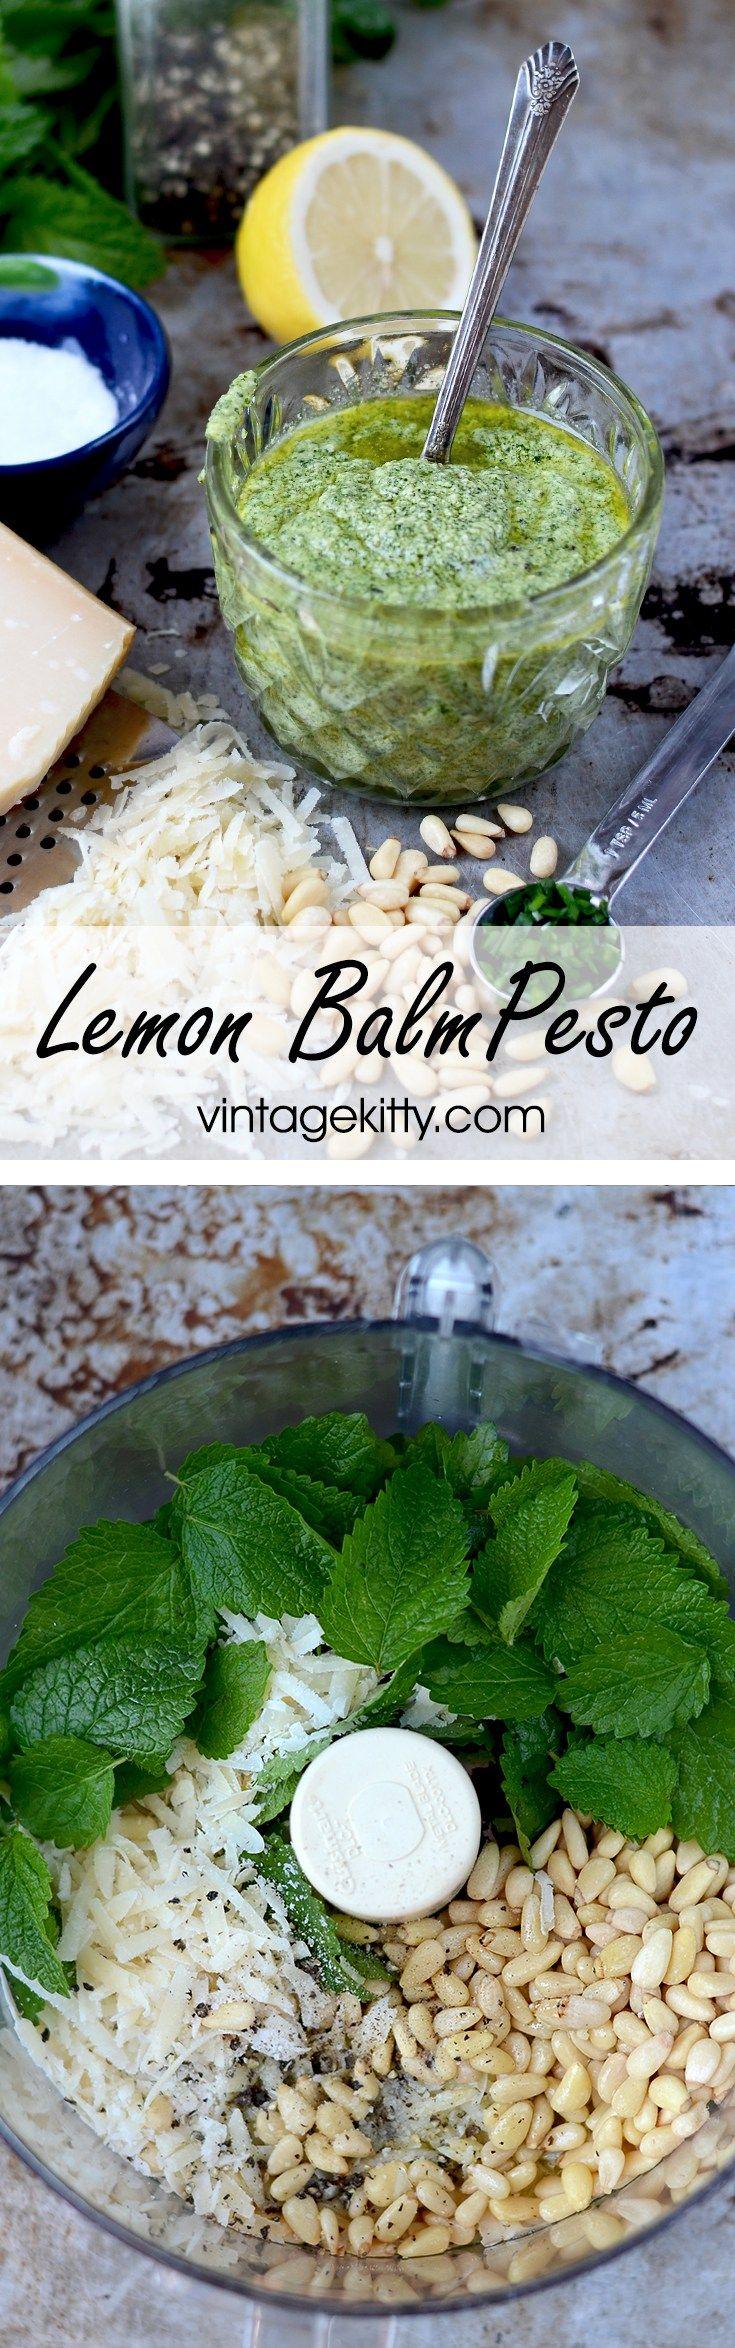 When life gives you lemon balm, make Lemon Balm Pesto! This mint family herb is…